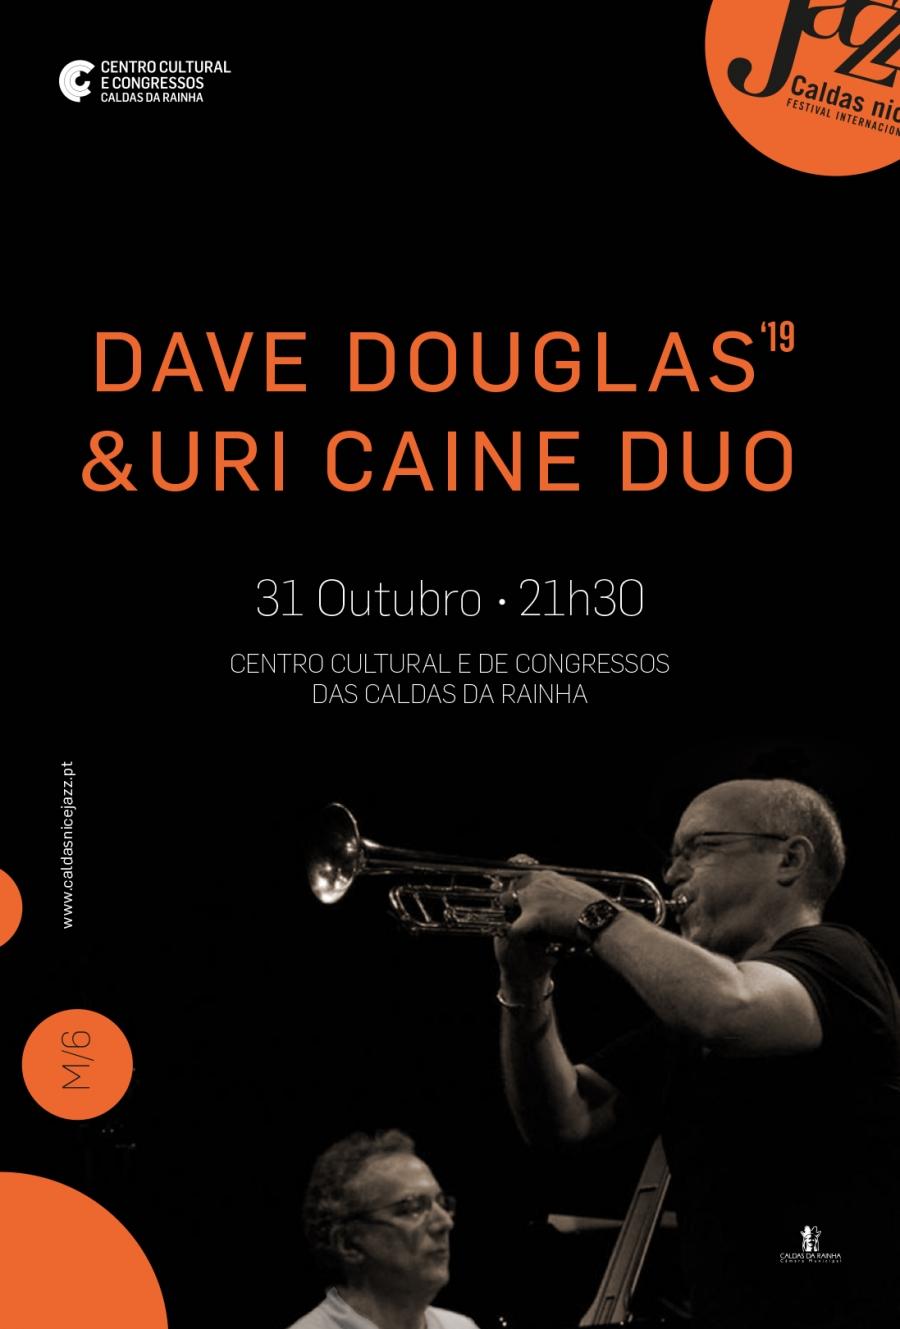 Dave Douglas & Uri Caine Duo